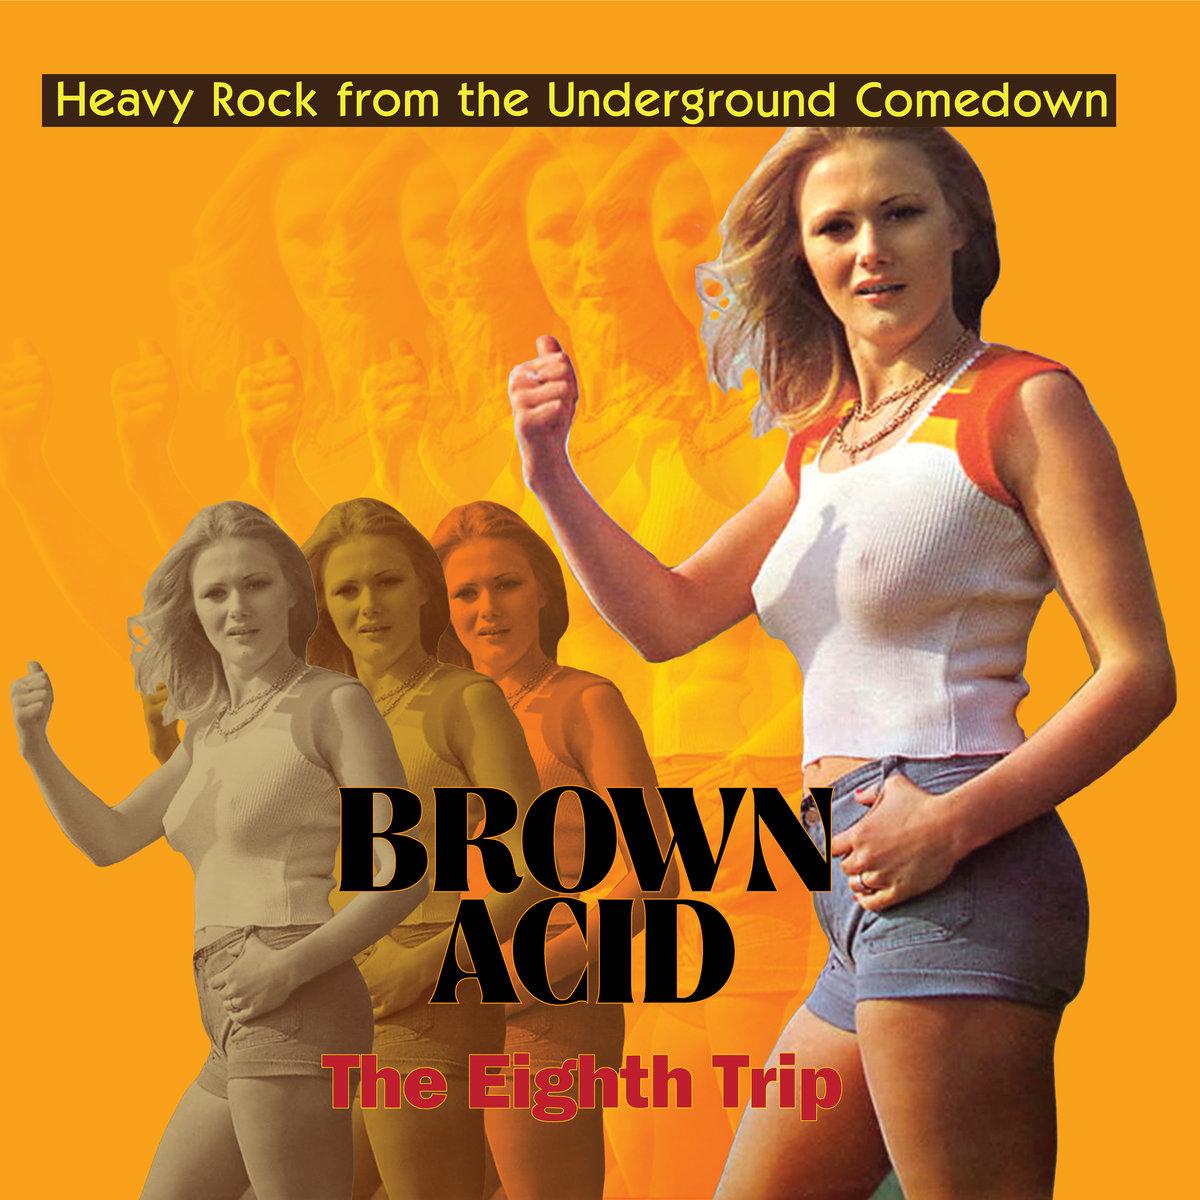 Brown Acid - The Eighth Trip [LP]